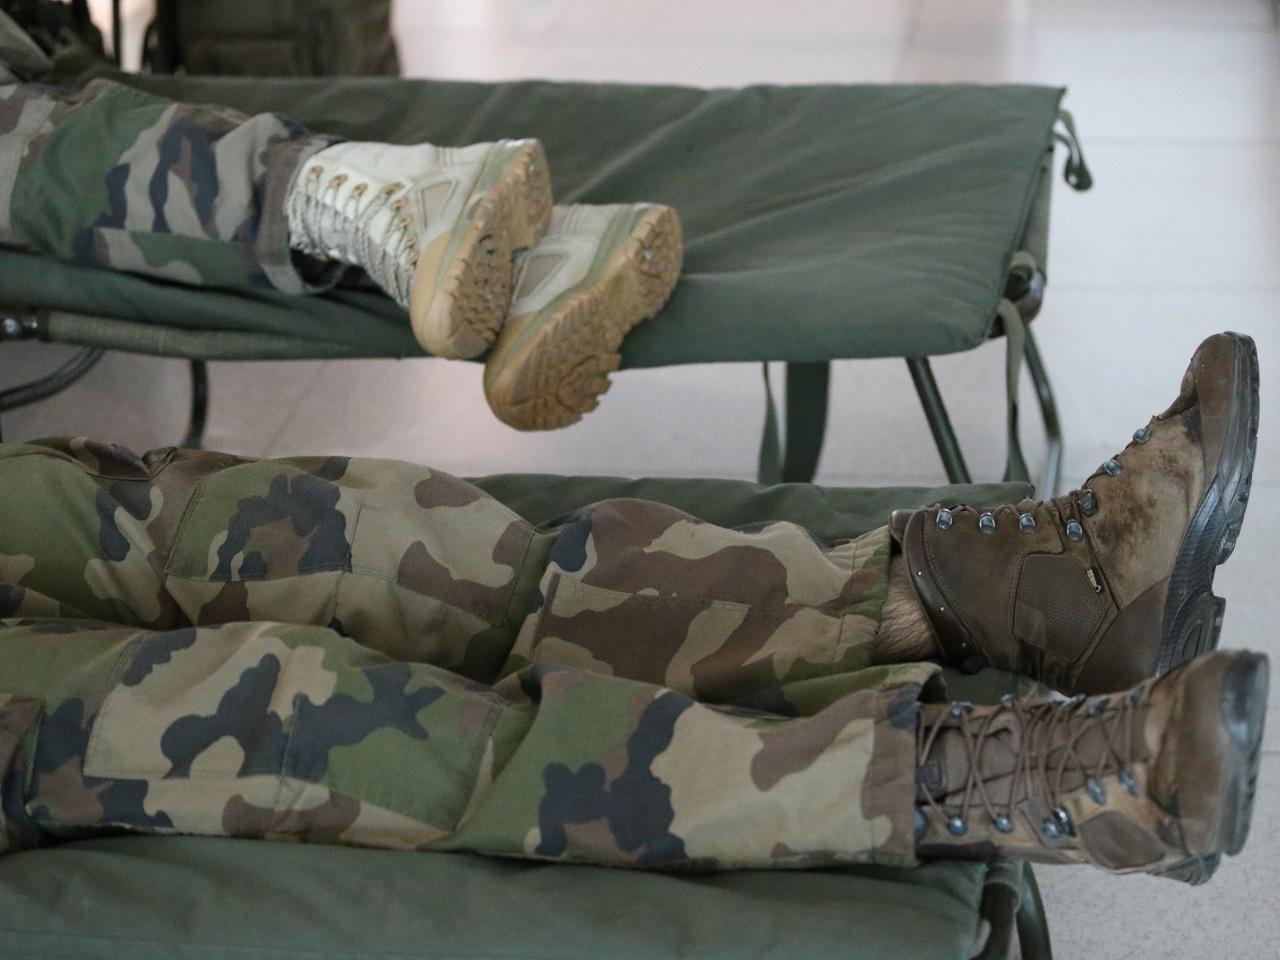 Les lits des soldats - LyonMag